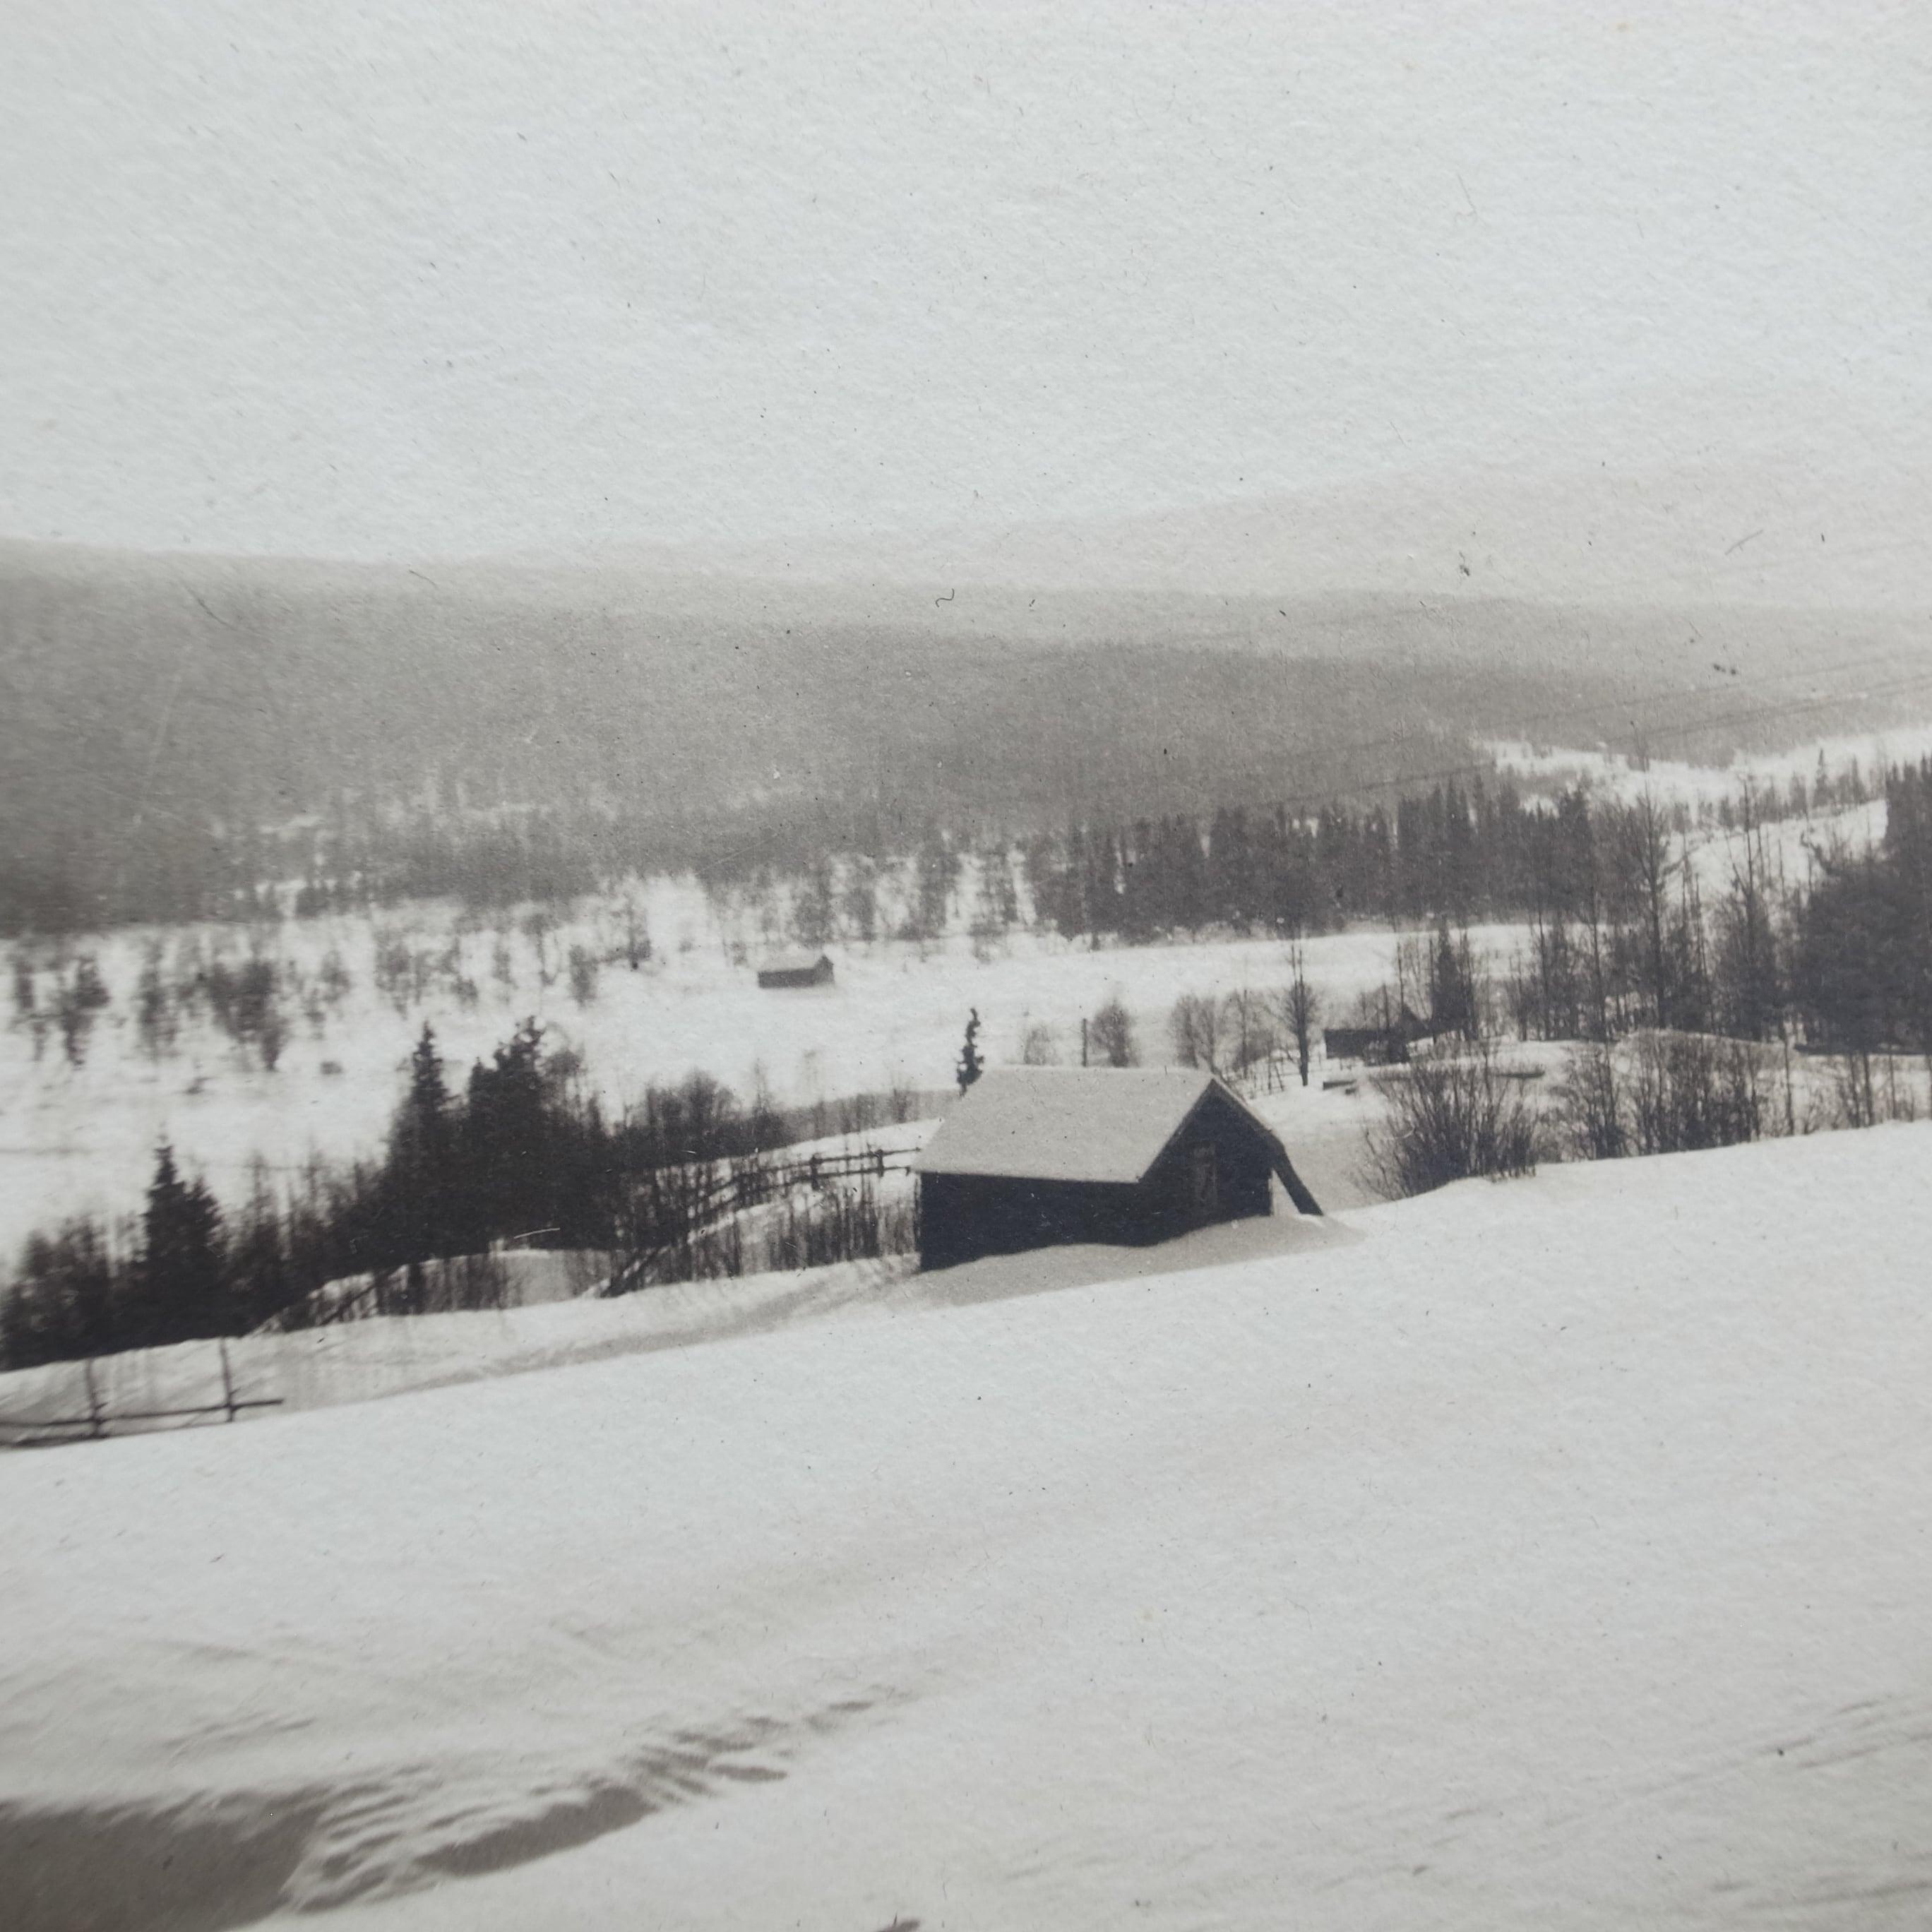 Old photo album / Memories of winter